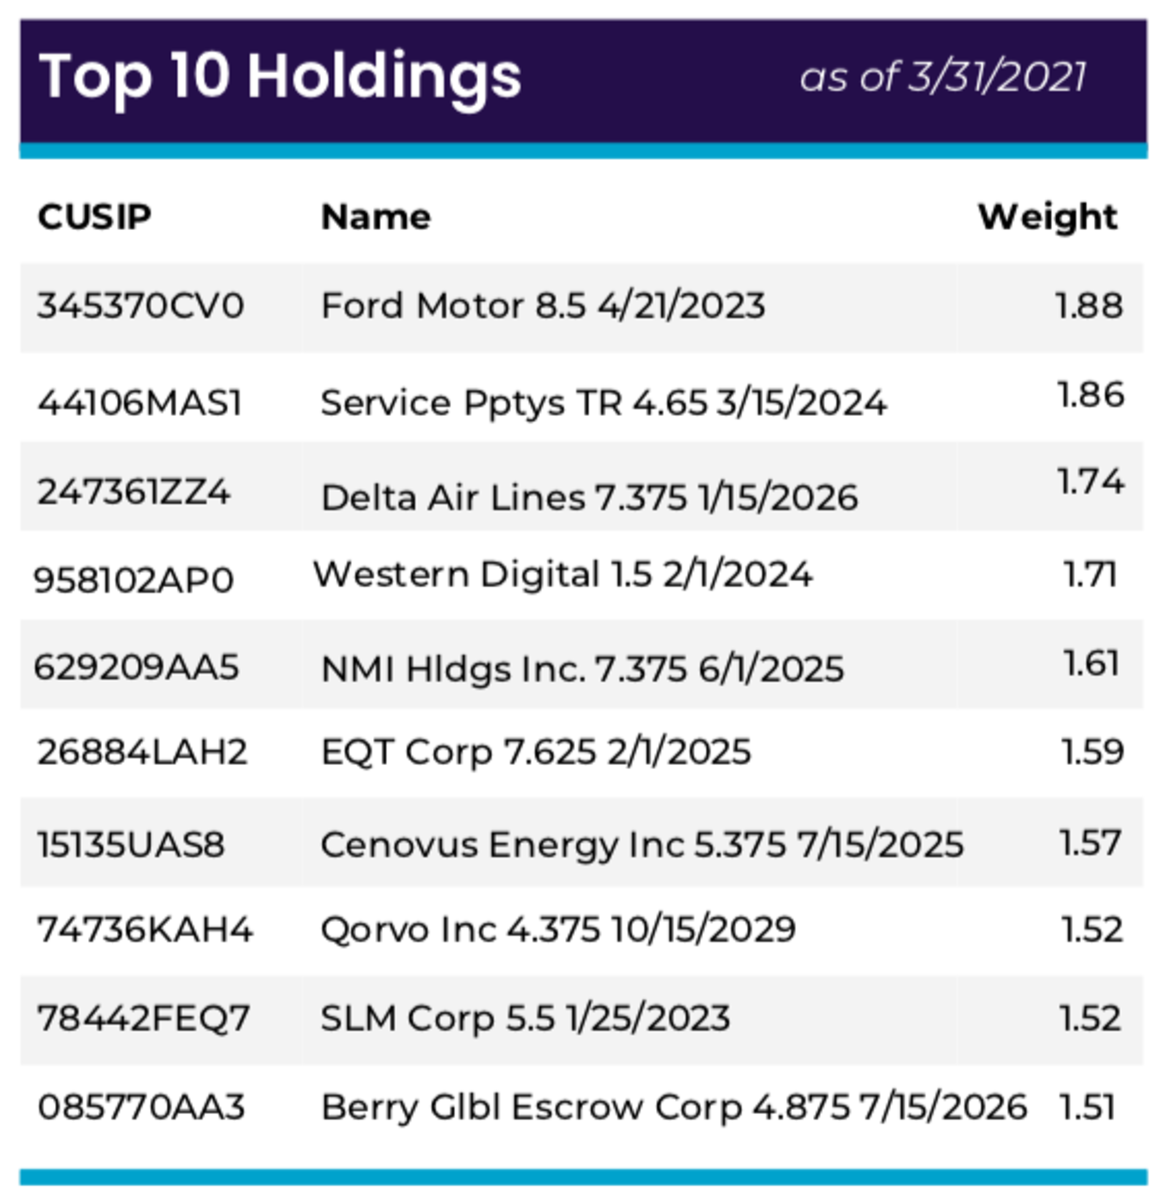 TGIF ETF Top Holdings